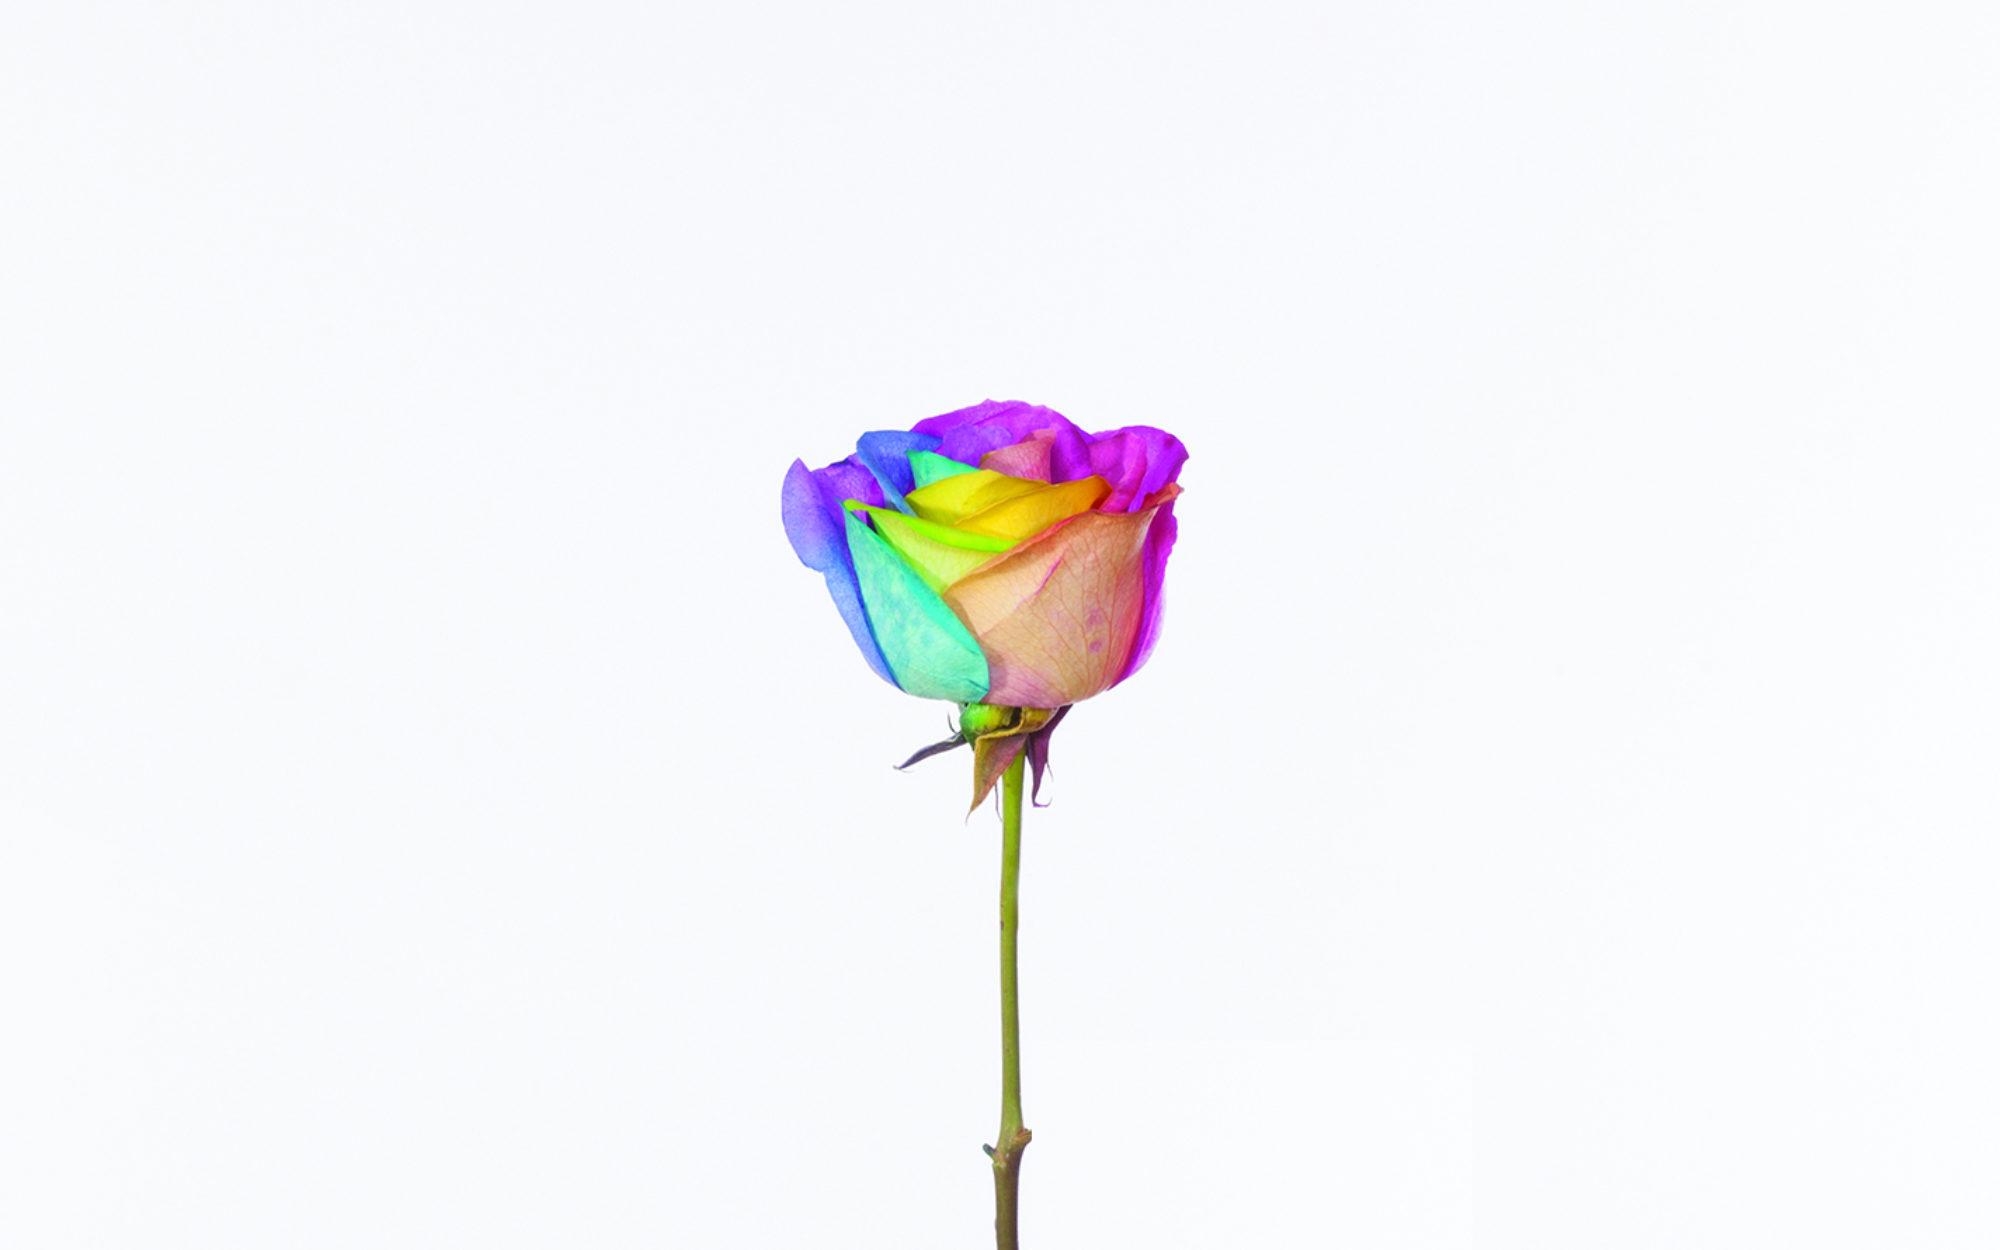 Virginia Poundstone Flower Mutations